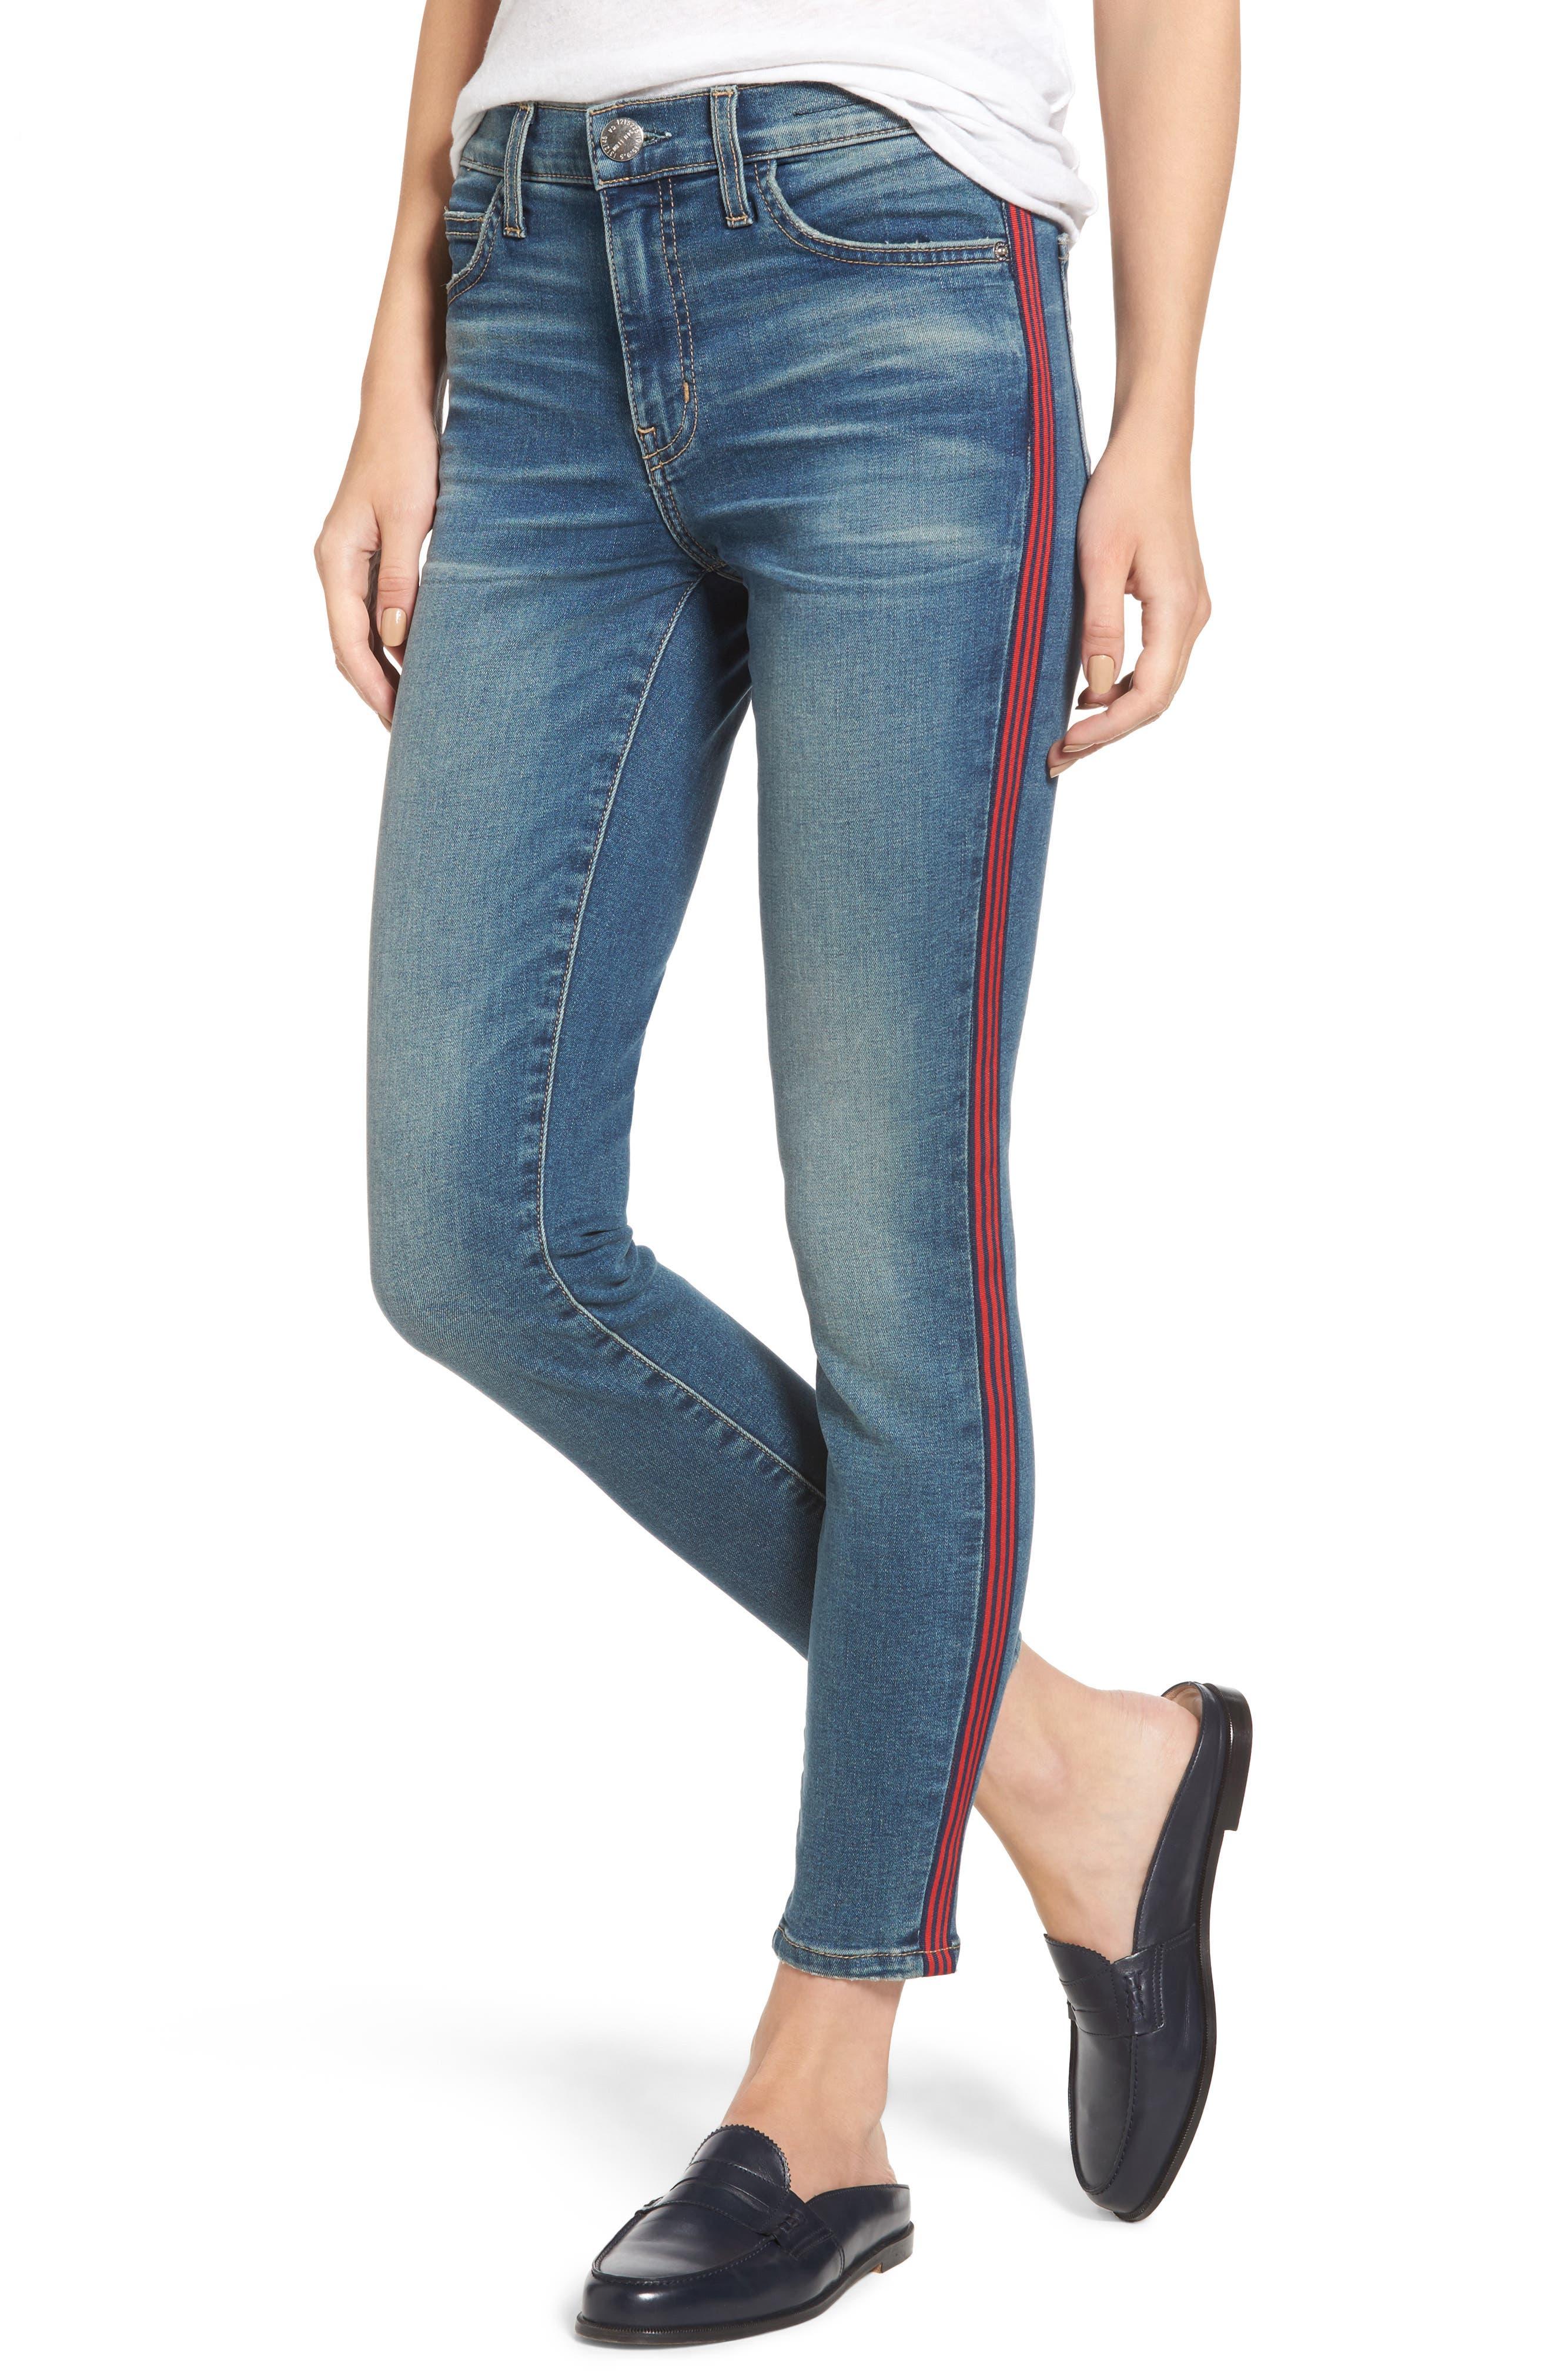 Alternate Image 1 Selected - Current/Elliott The High Waist Stiletto Ankle Skinny Jeans (Powell/Applied Stripe)